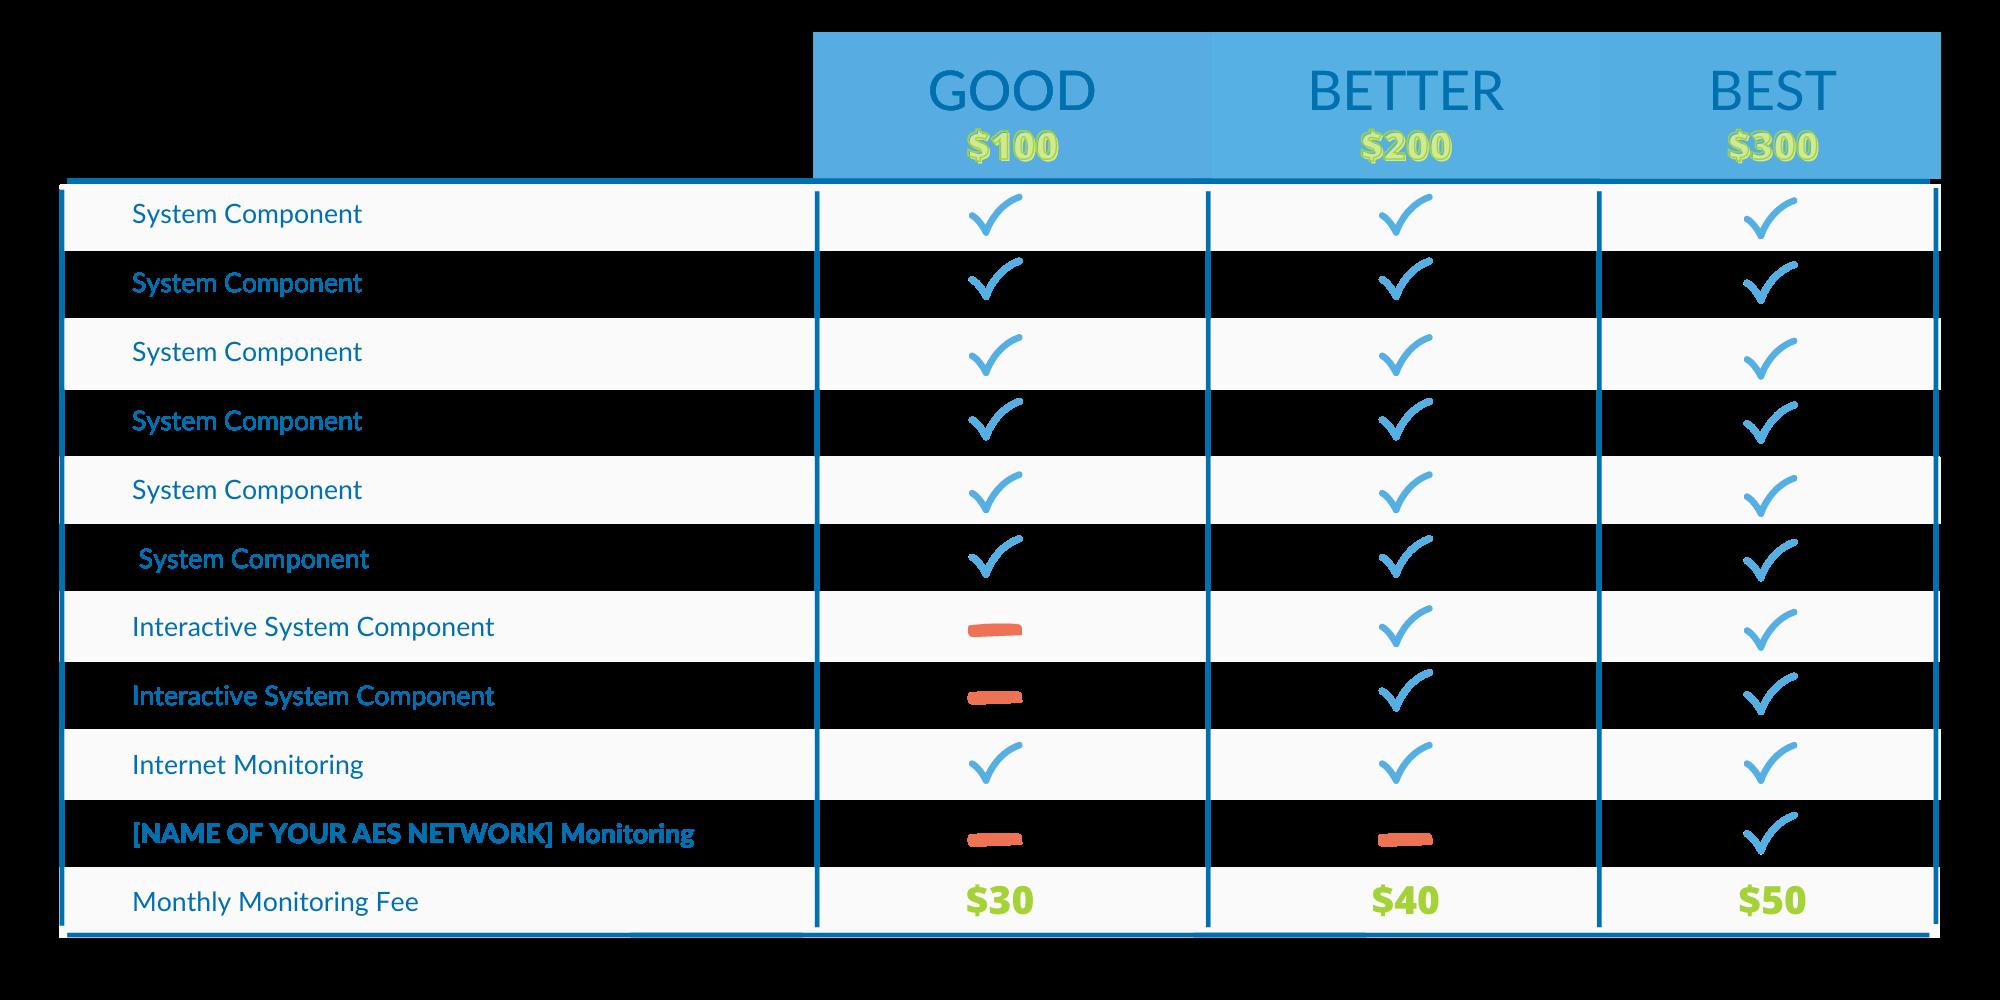 Example Pricing Matrix